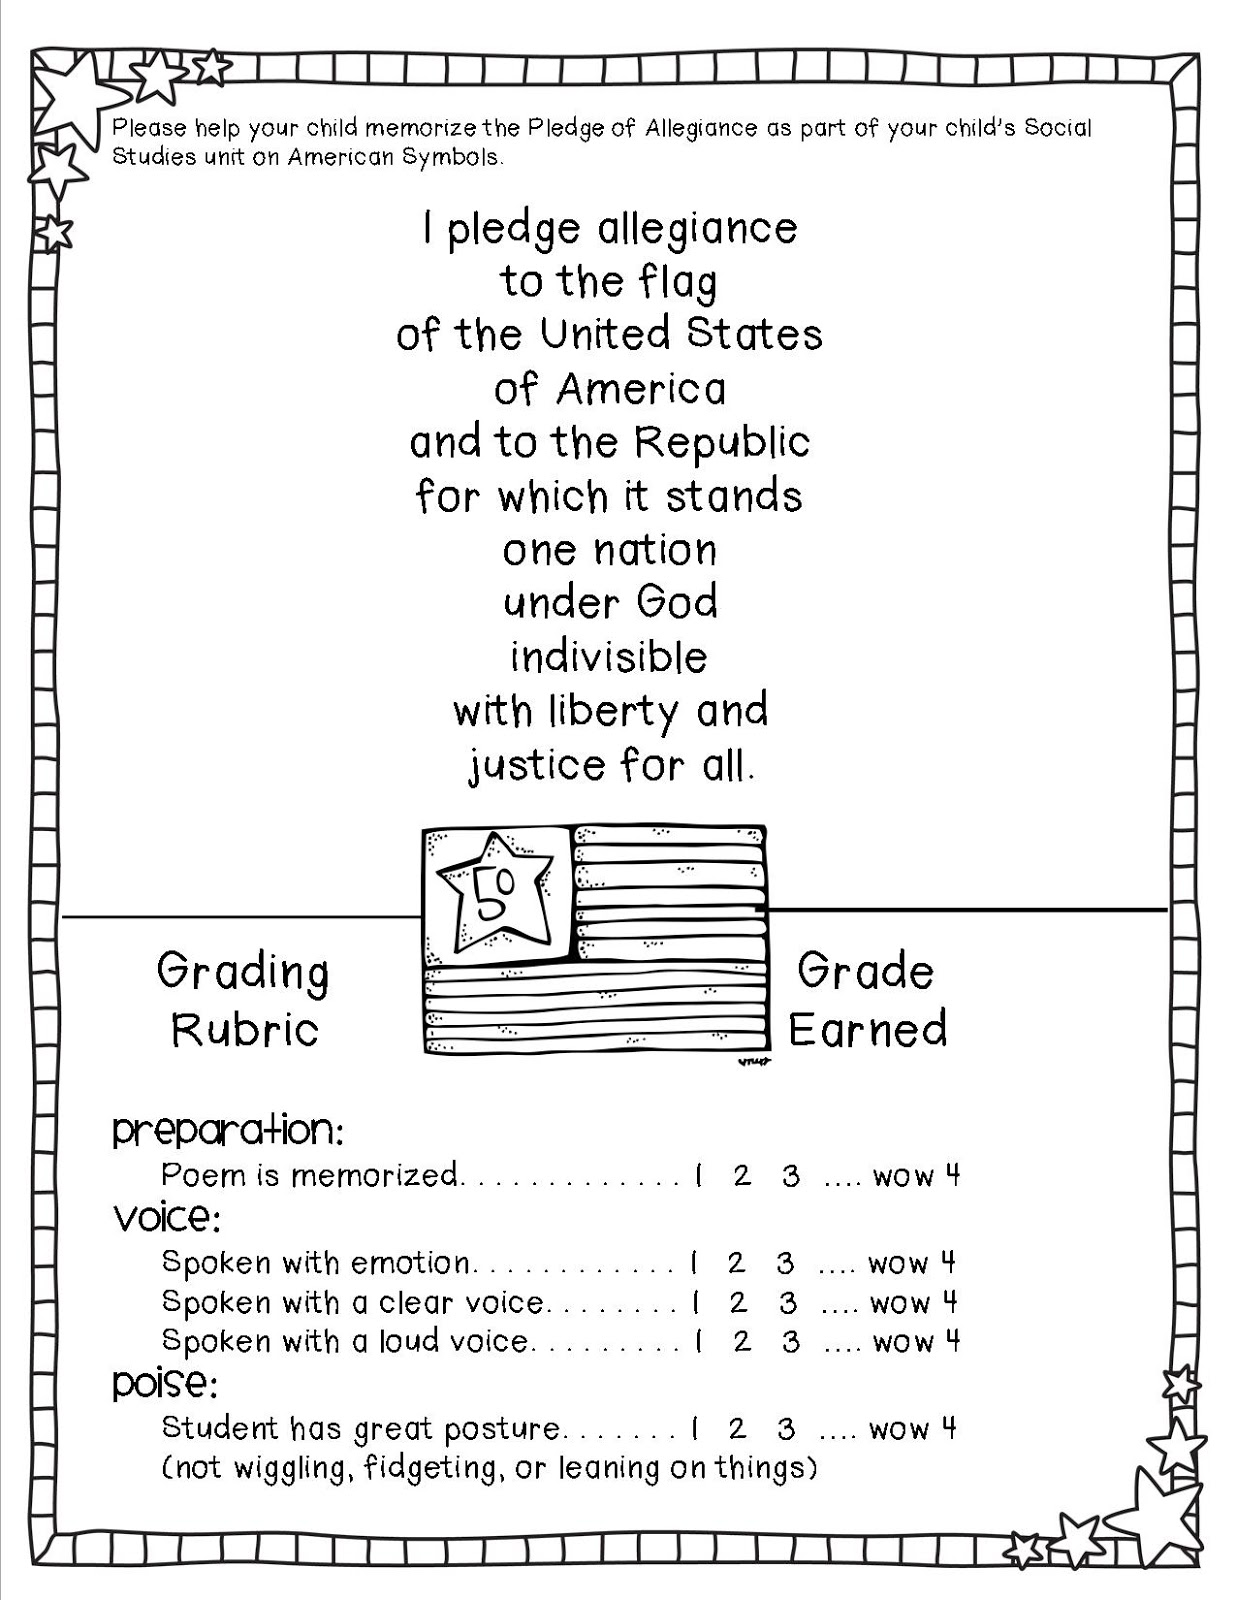 Oral Reading Fluency Rubric 3rd Grade